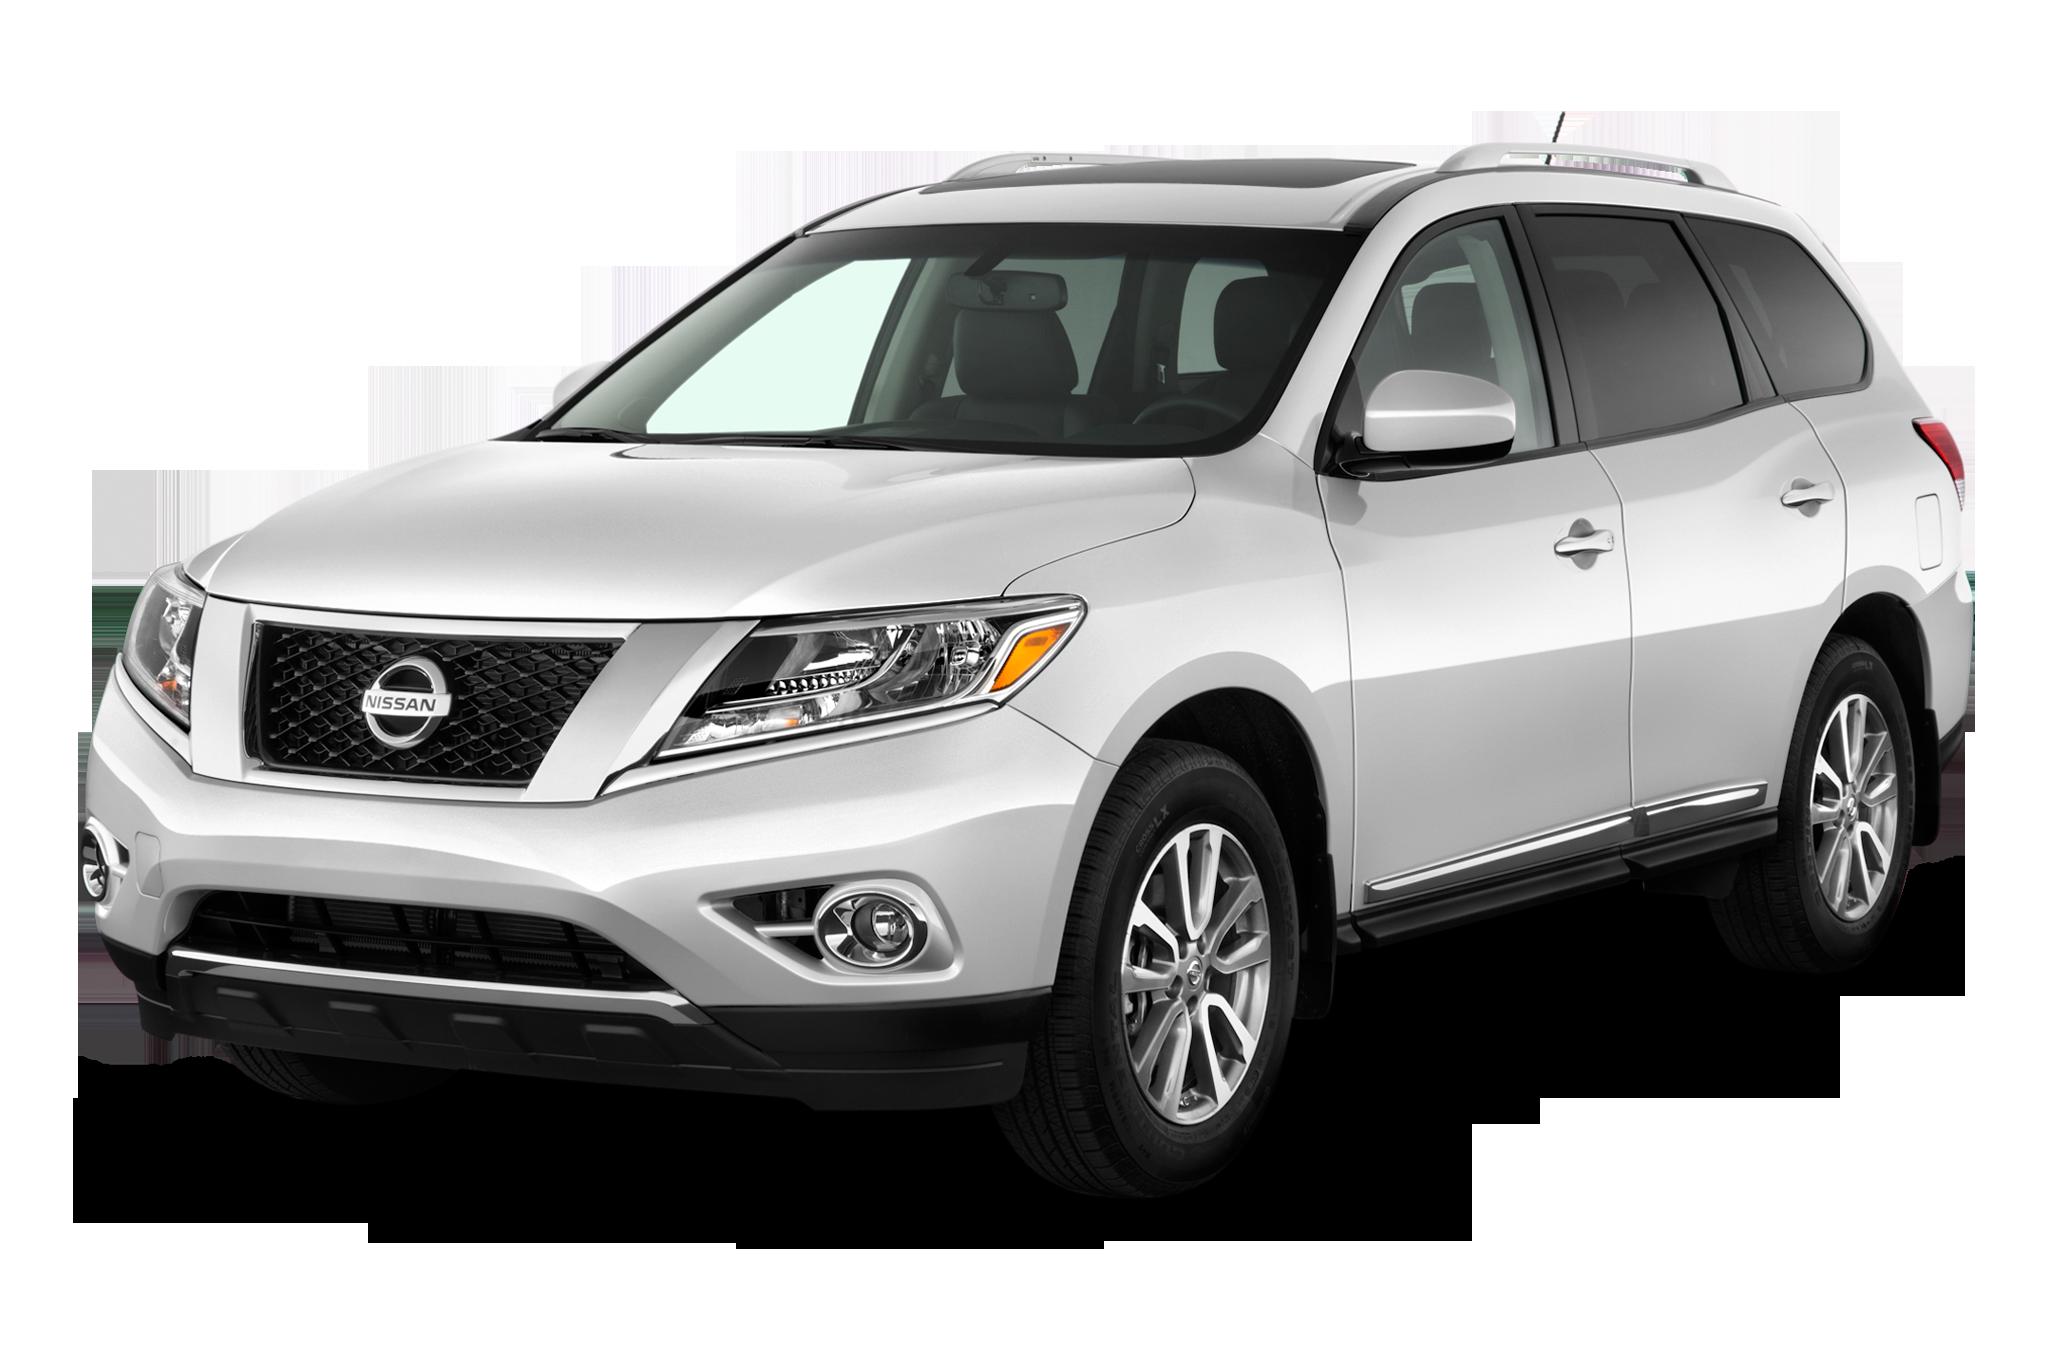 2014 Nissan Pathfinder Pricing Rises  200  Starts At  29 710